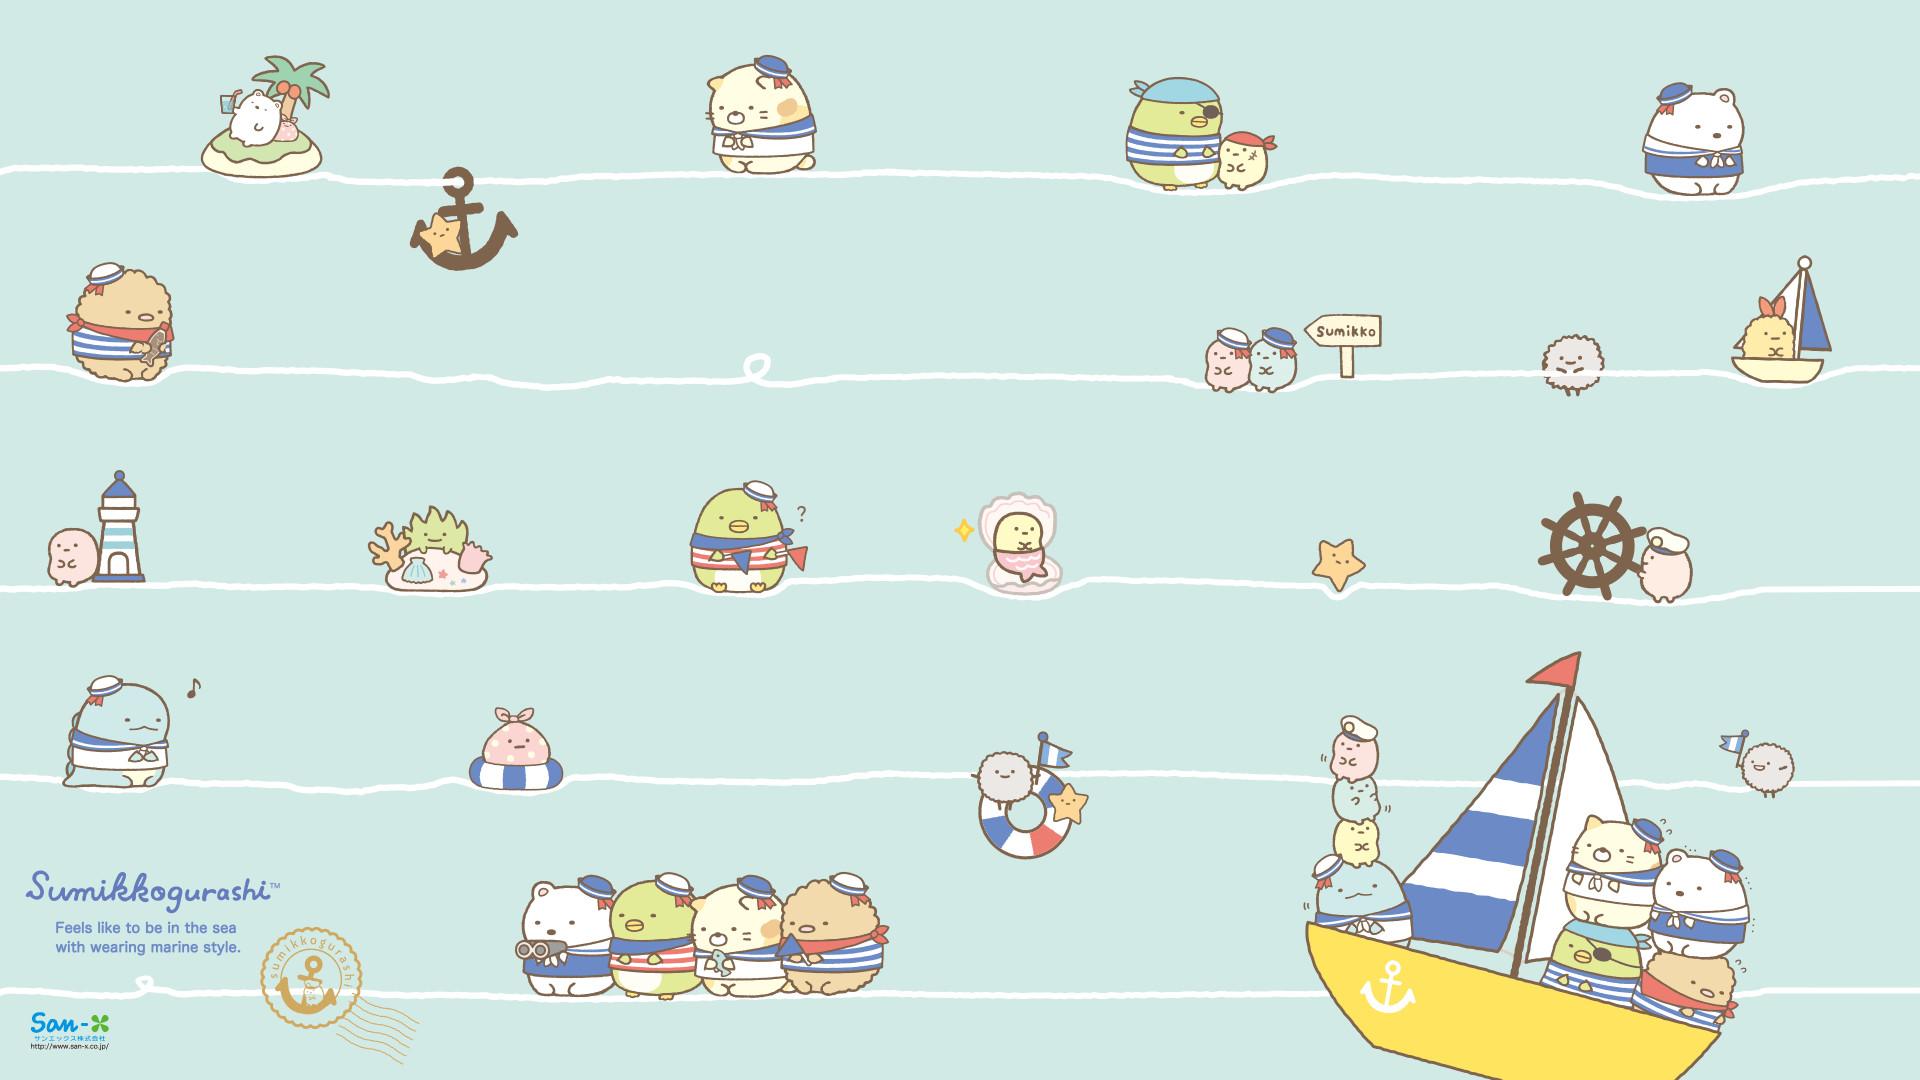 Sumikkogurashi Marine Series Wallpaper